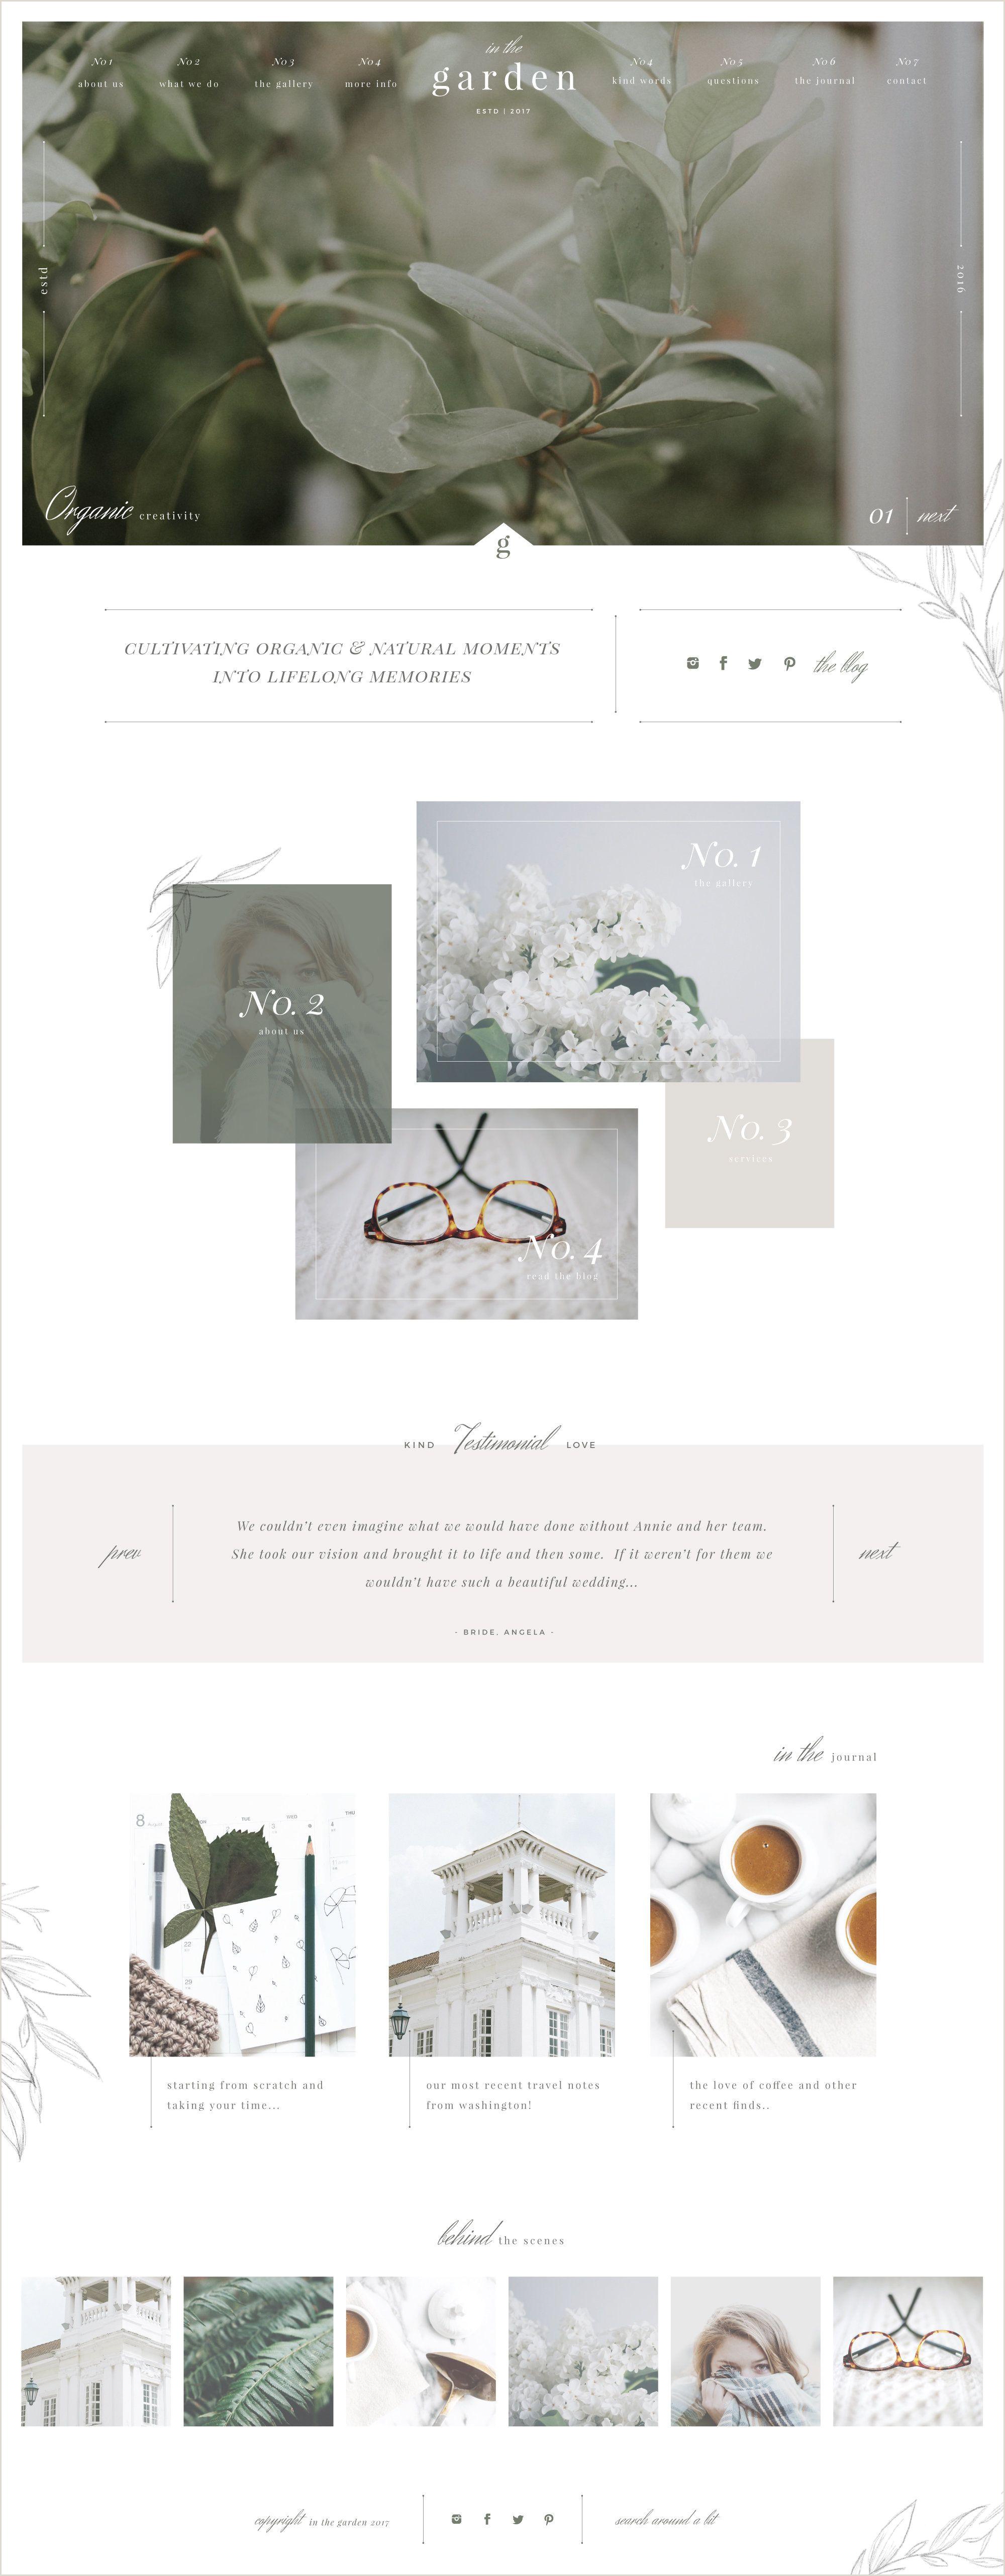 A Sophisticated & Creative Website Template Design